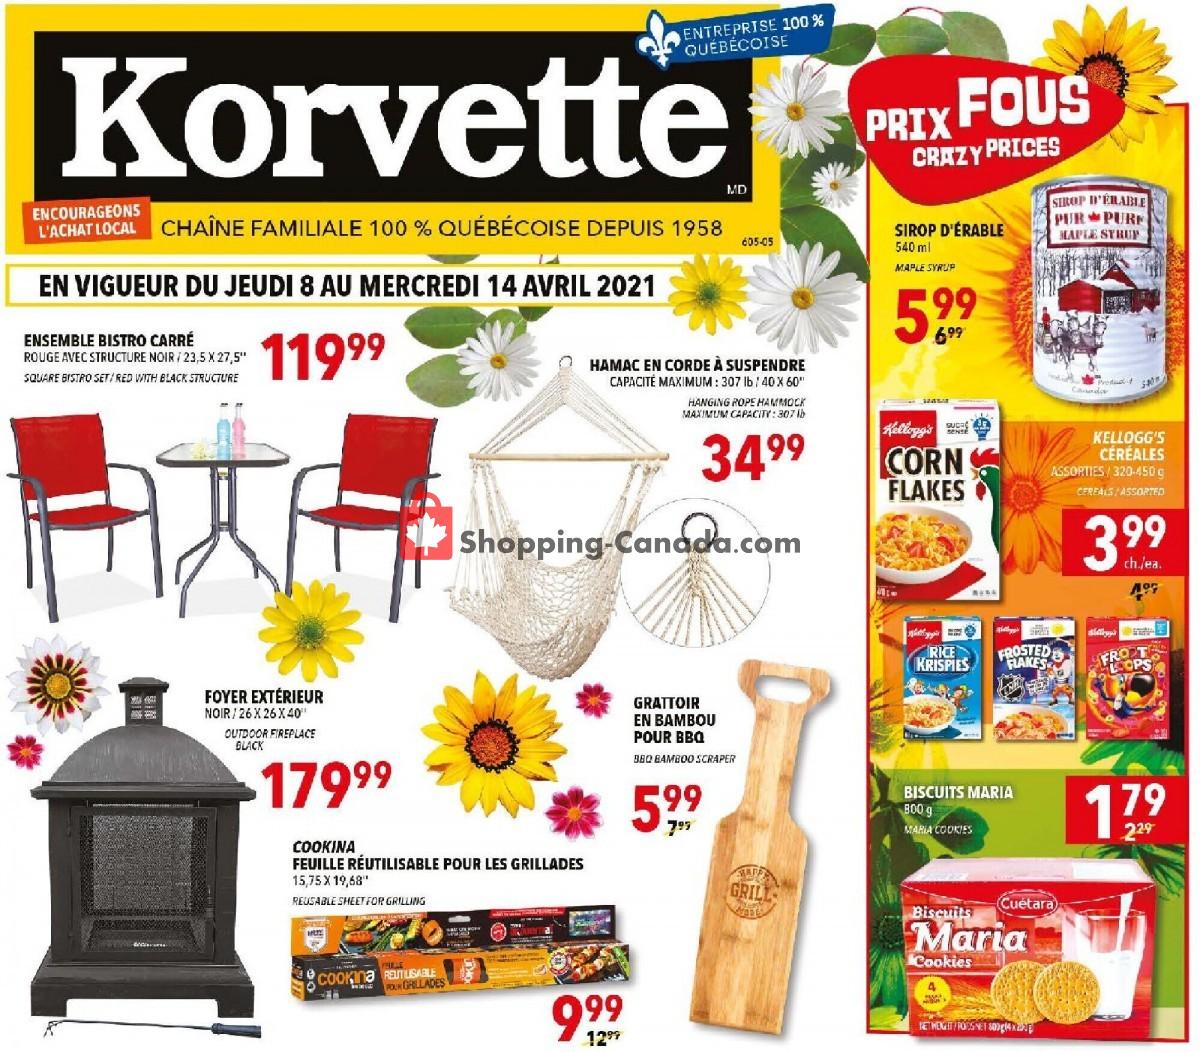 Flyer Korvette Canada - from Thursday April 8, 2021 to Wednesday April 14, 2021